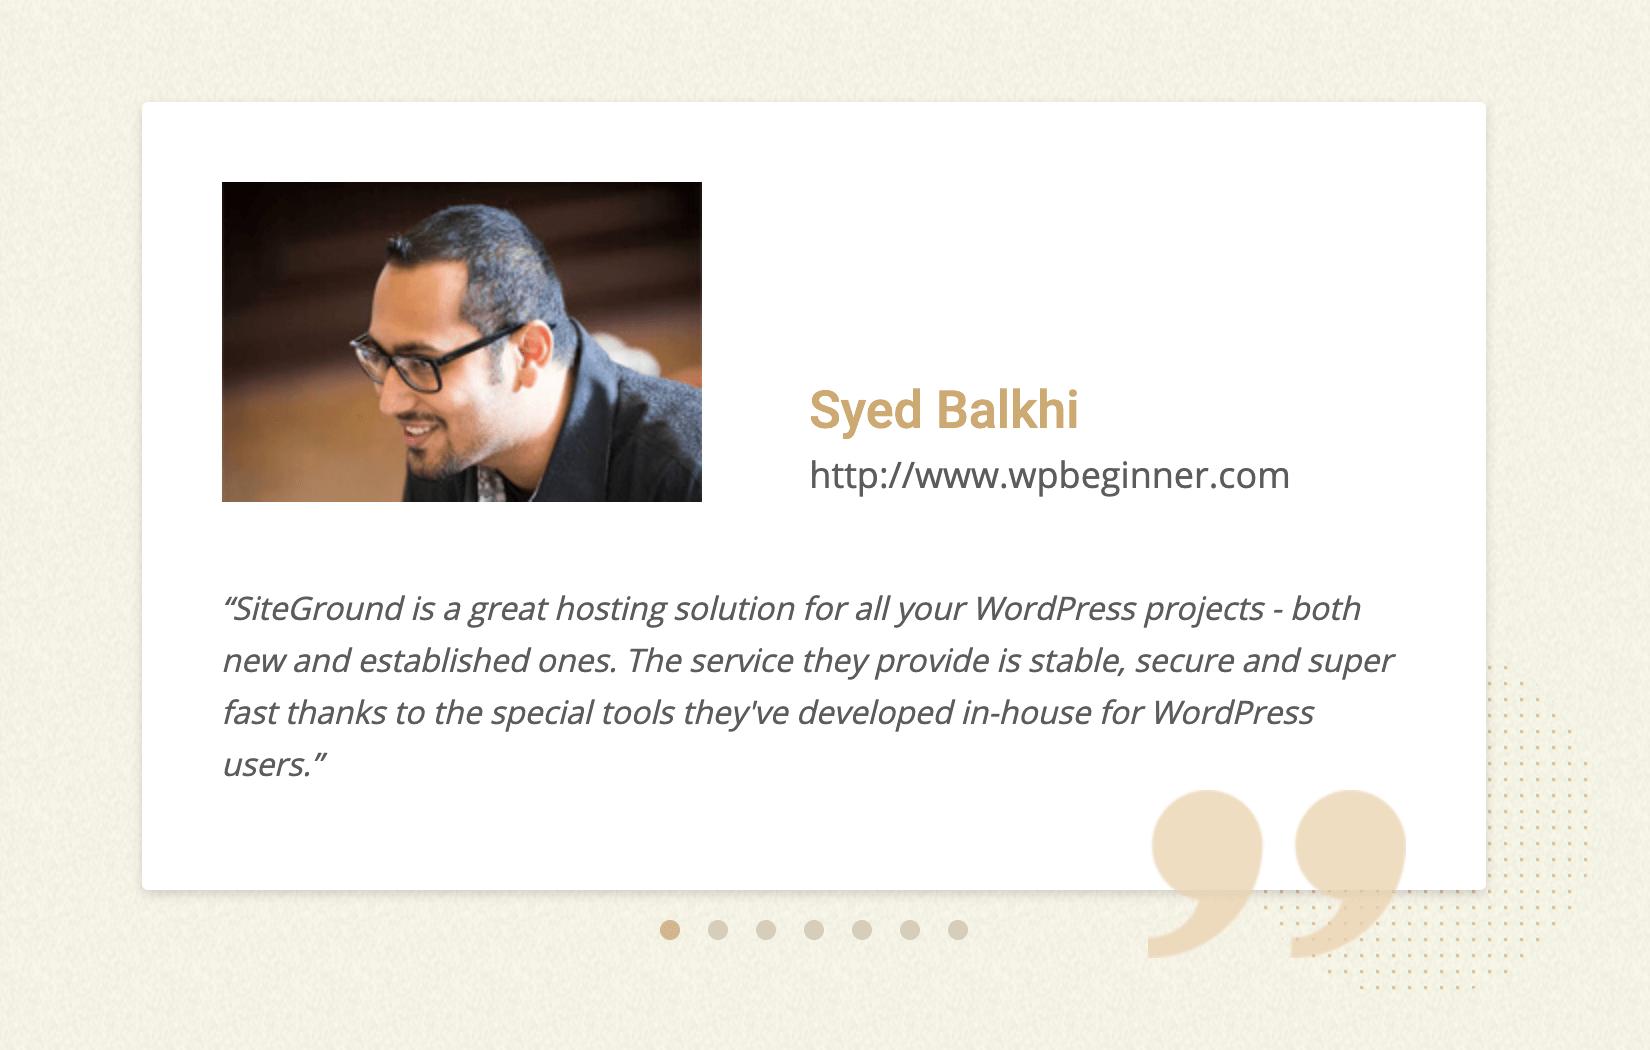 Syed Balkhi – Founder of WPBeginner